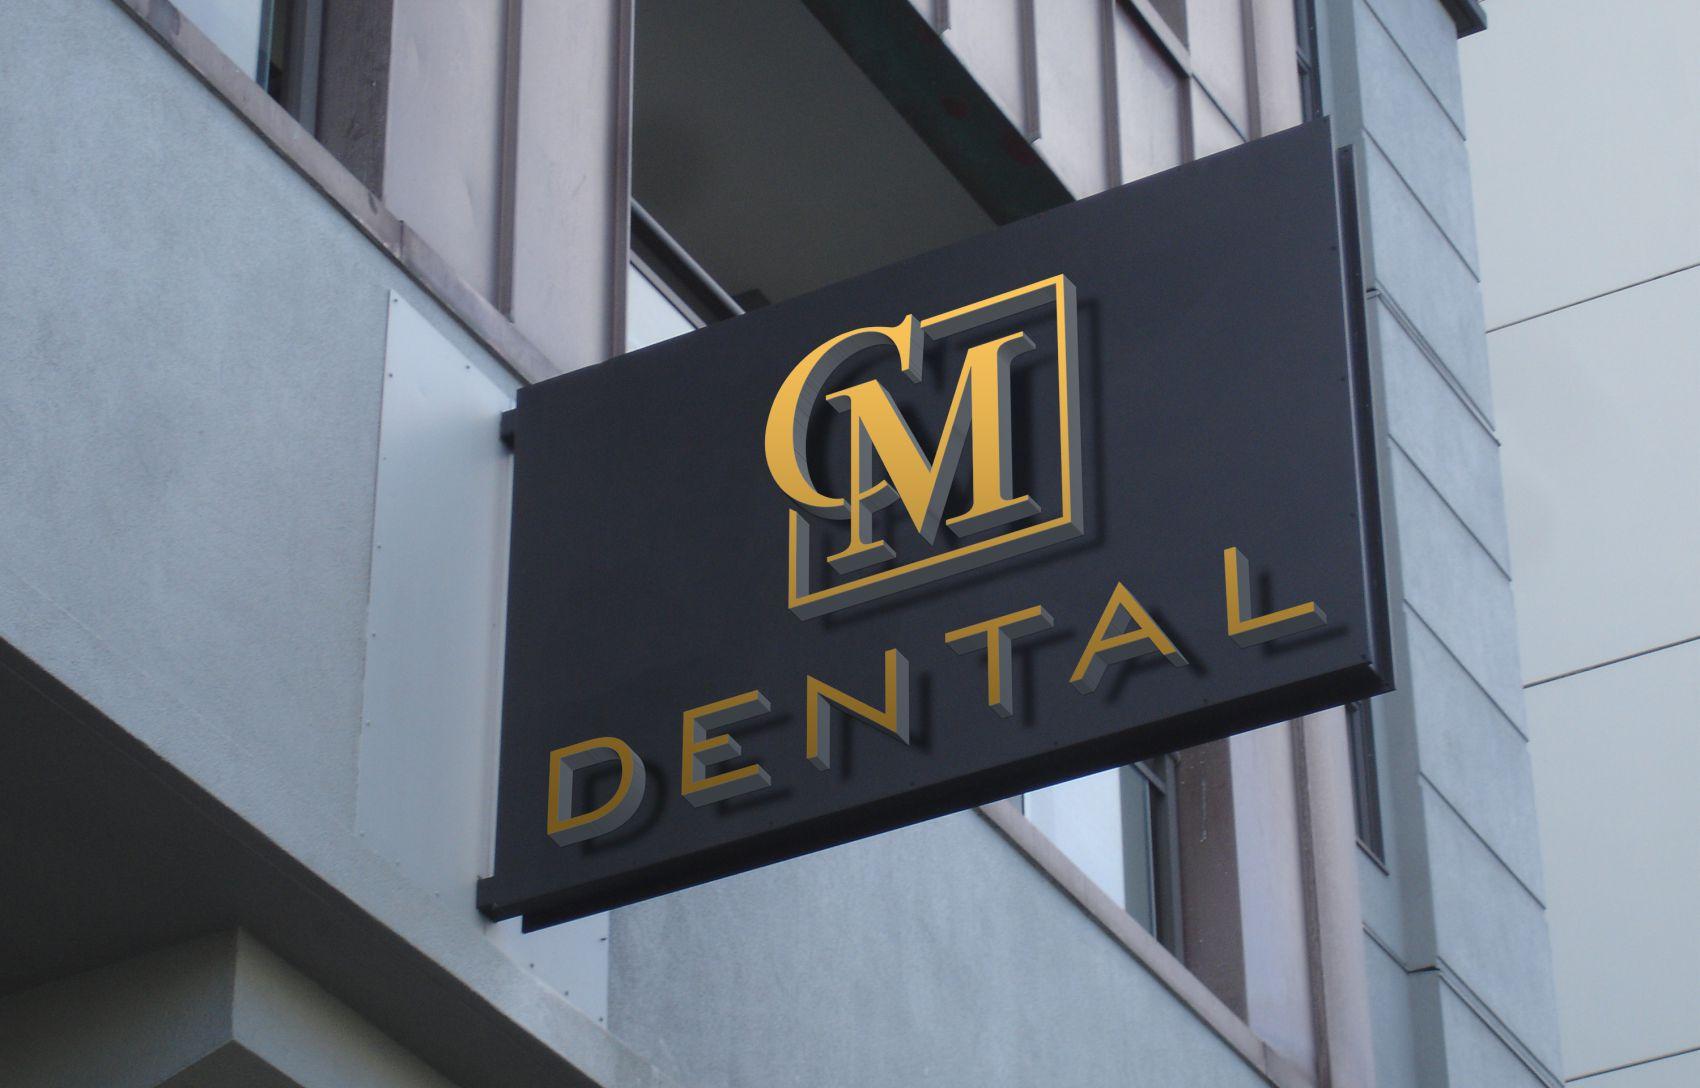 Exterior-Shop-Sign-CM-Dental